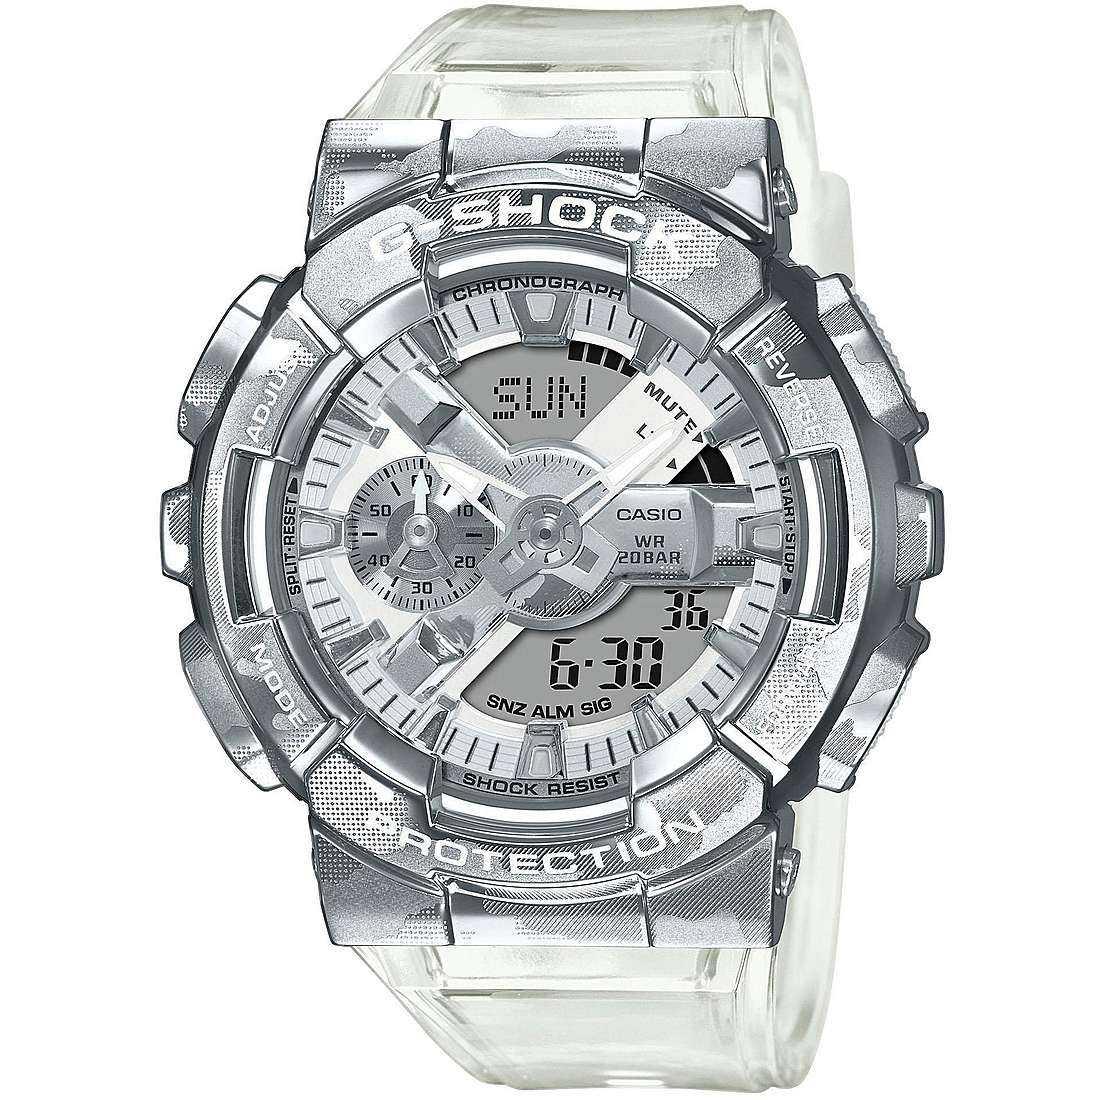 Watch multifunction man casio g shock gm 110scm 1aer 443234